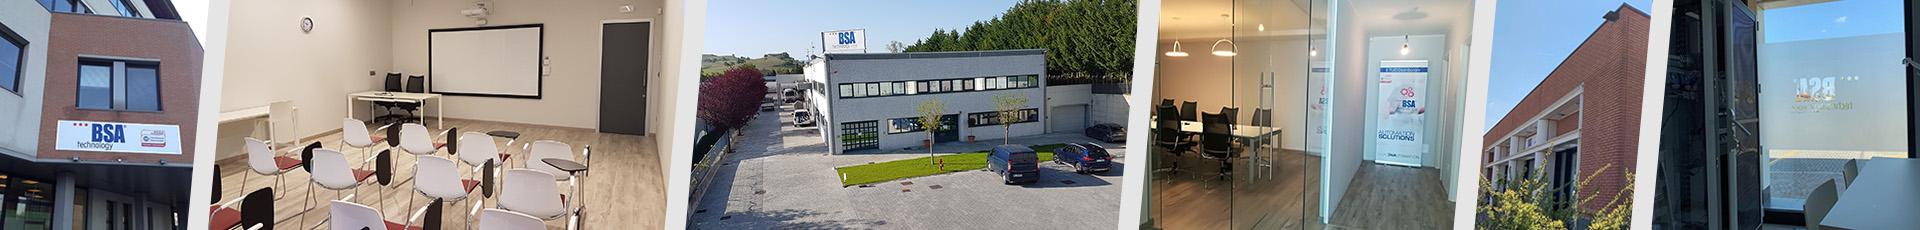 Uffici Commerciali Technology BSA